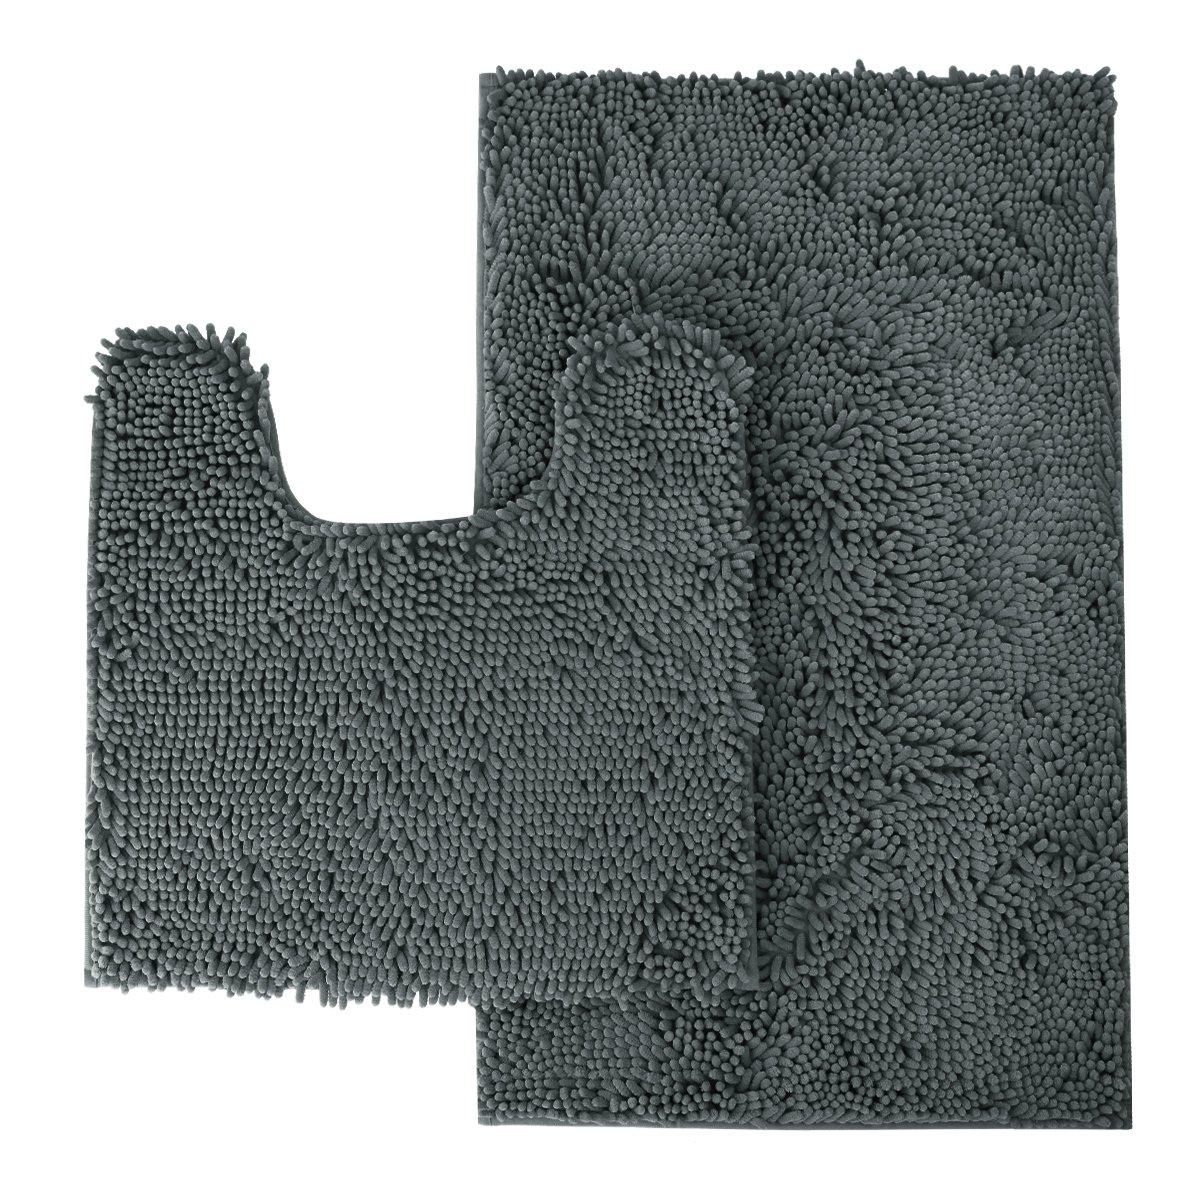 MAYSHINE Bathroom Rugs Toilet Sets and Shaggy Non Slip Machine Washable Soft Microfiber Bath Contour mat (Dark Gray 32'' 20''/20'' 20'' U-Shaped)